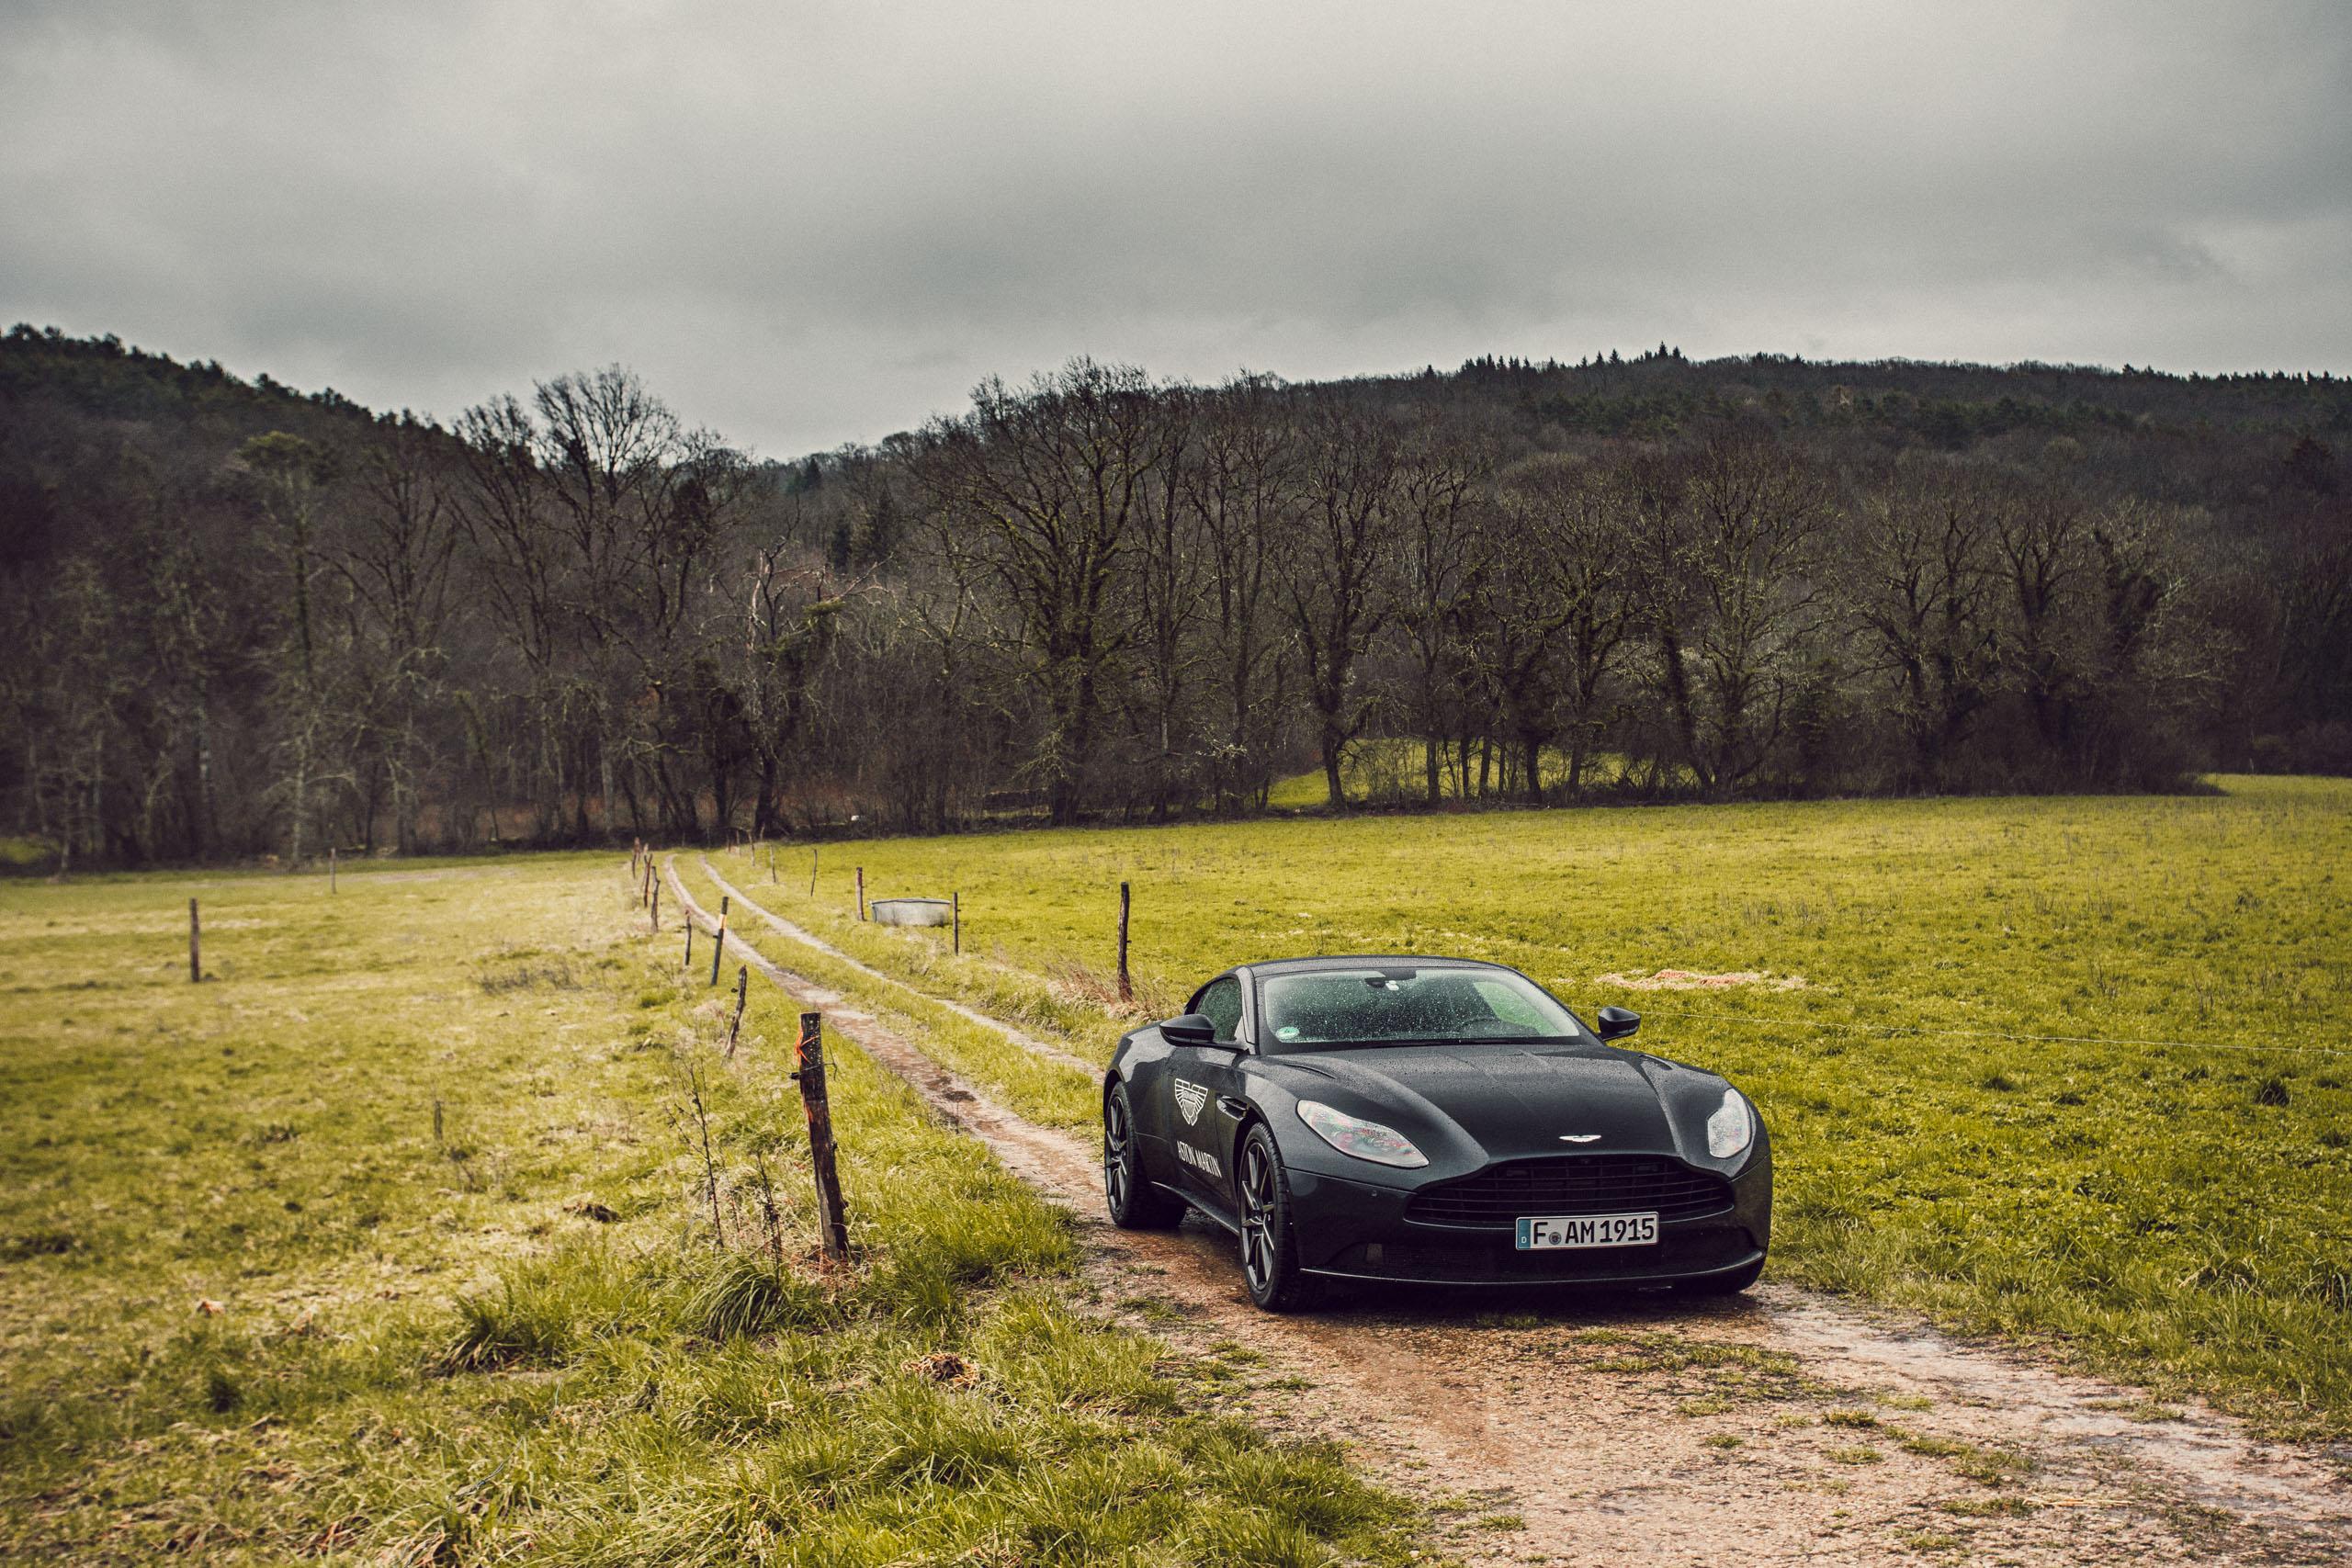 Schwarzer Aston Martin Geneva auf einem Feldweg